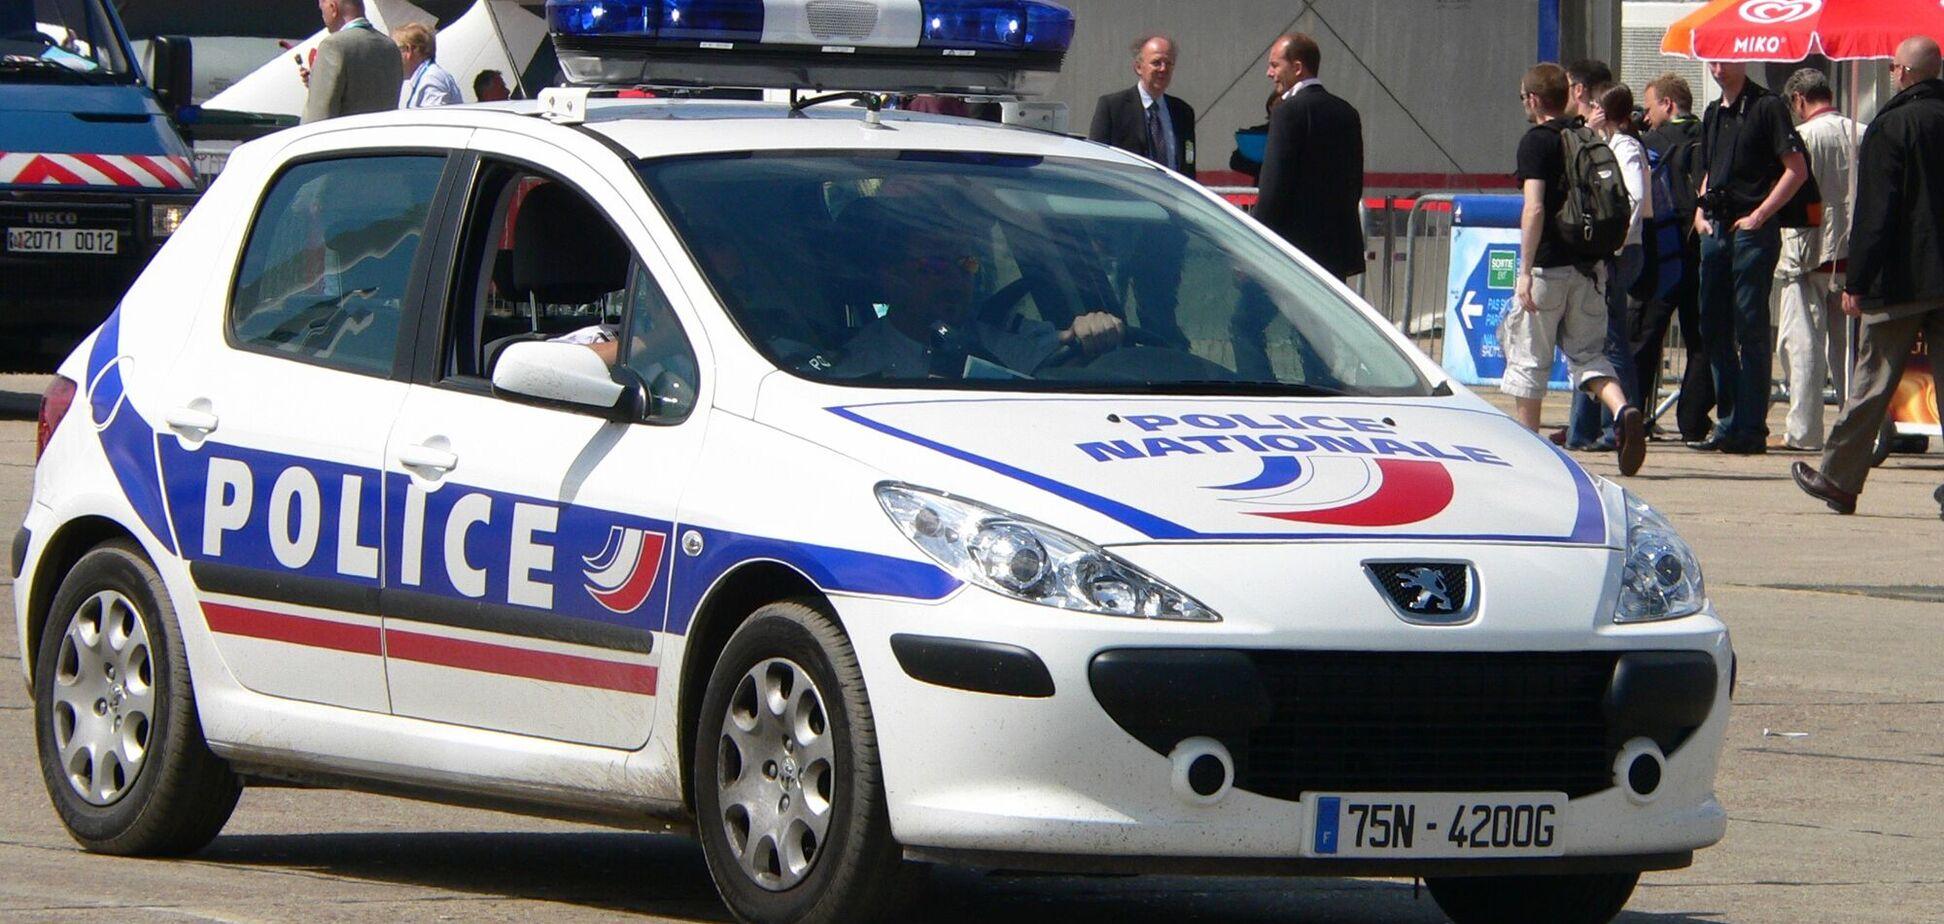 Полиция застрелила террориста, который обезглавил человека в Париже